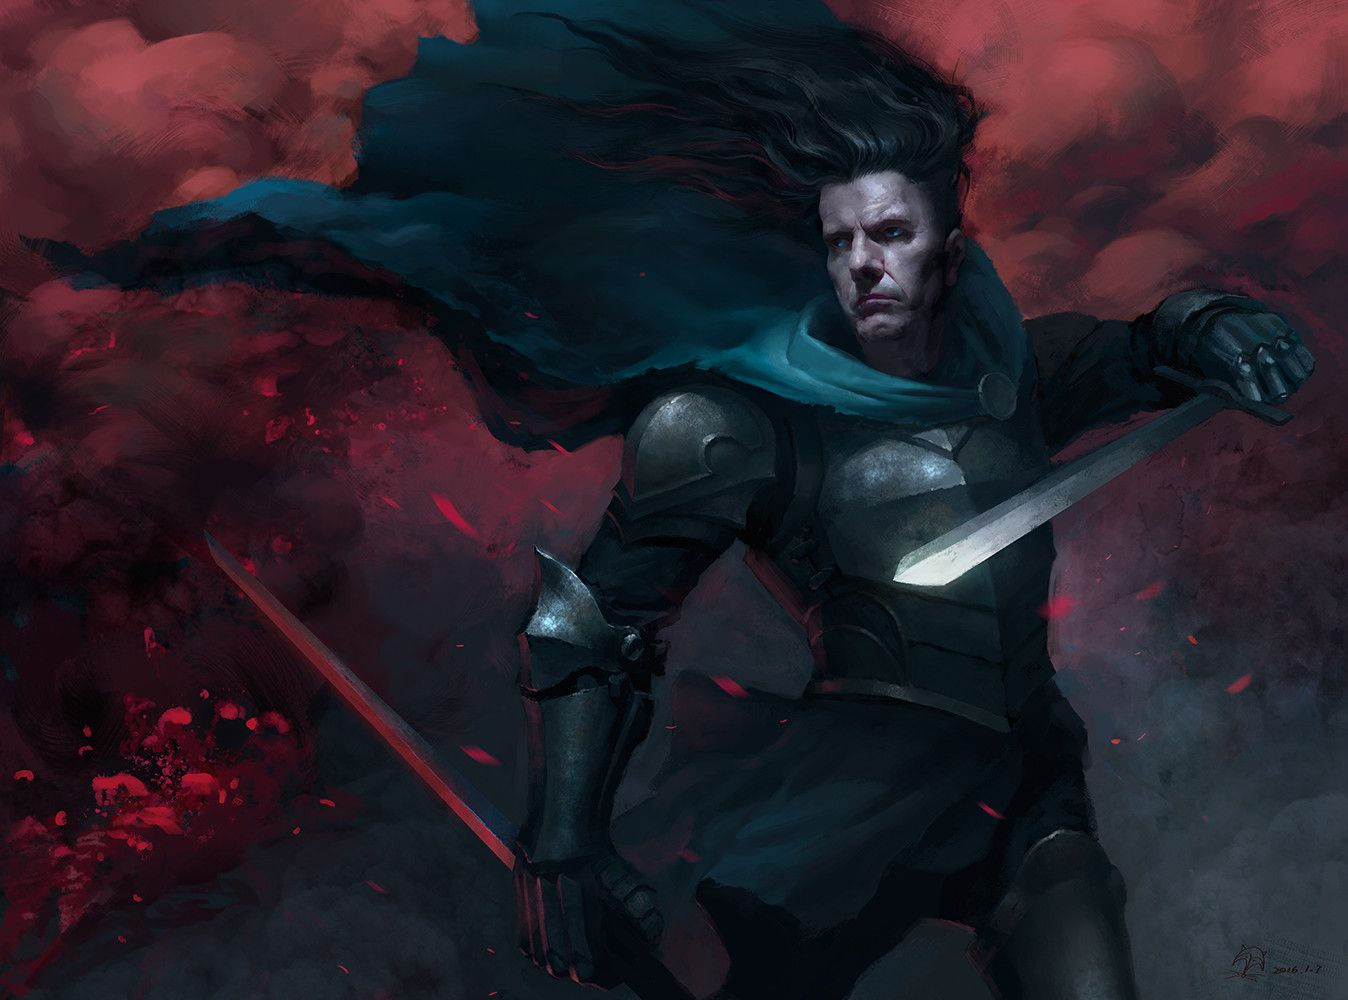 Black Knight, fox wu on ArtStation at https://www.artstation.com/artwork/black-knight-4